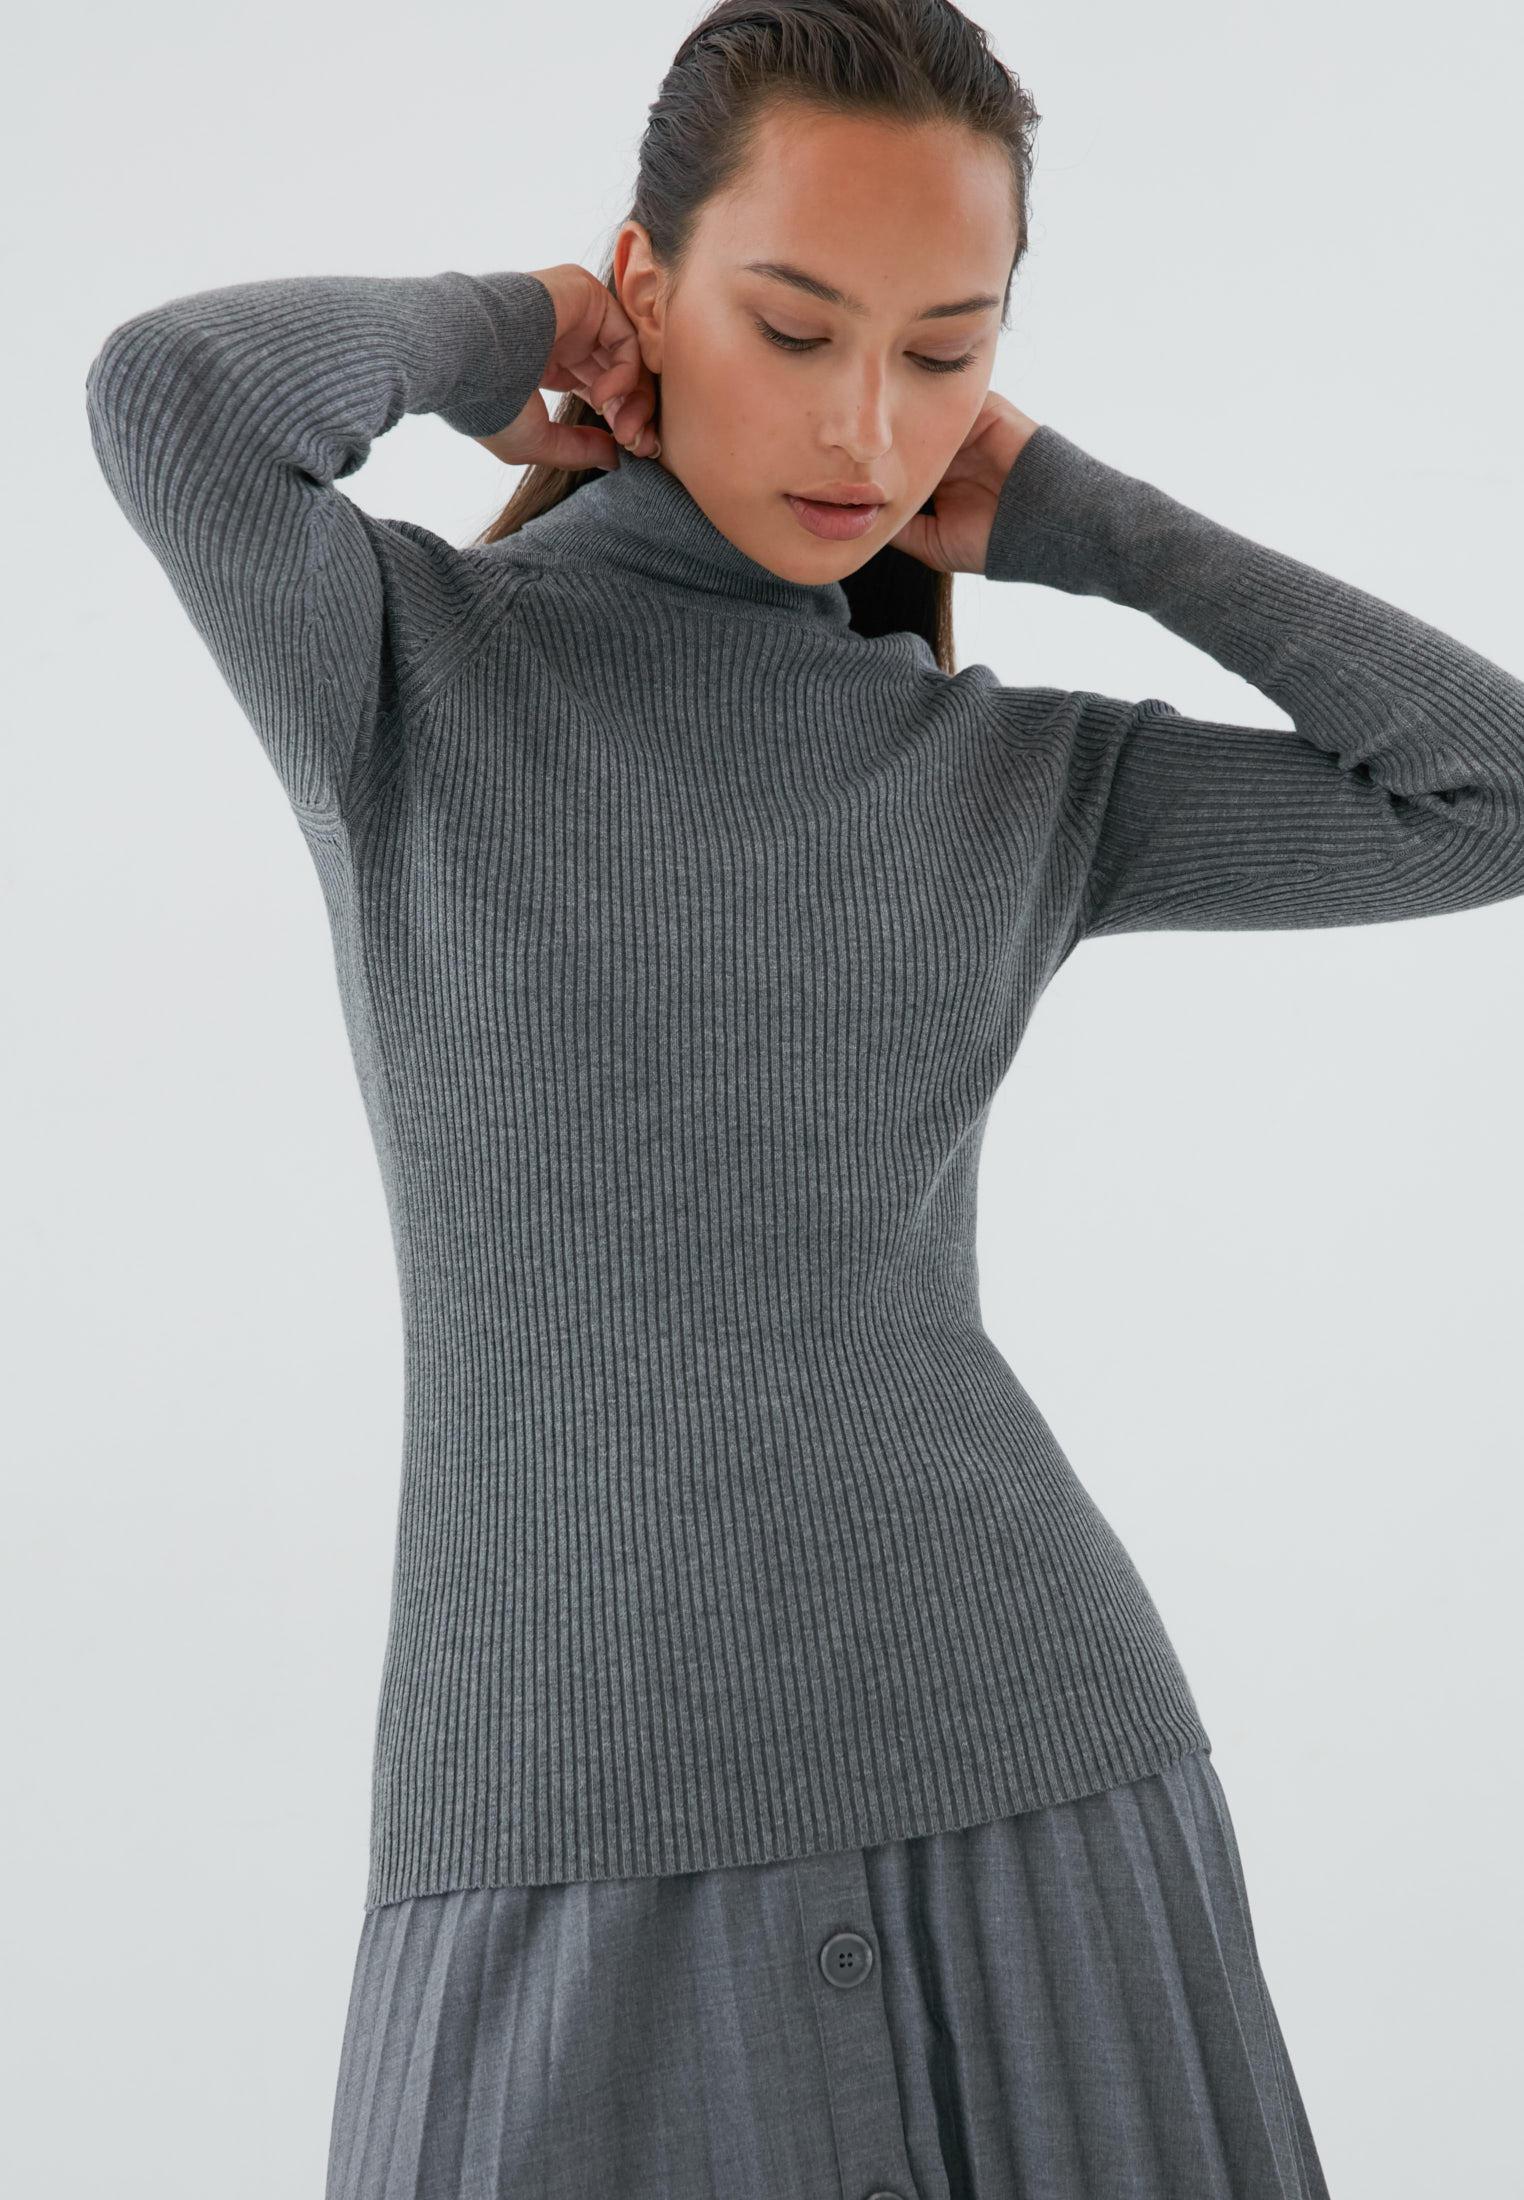 Водолазка Zarina купить за 799 ₽ в интернет-магазине Lamoda.ru